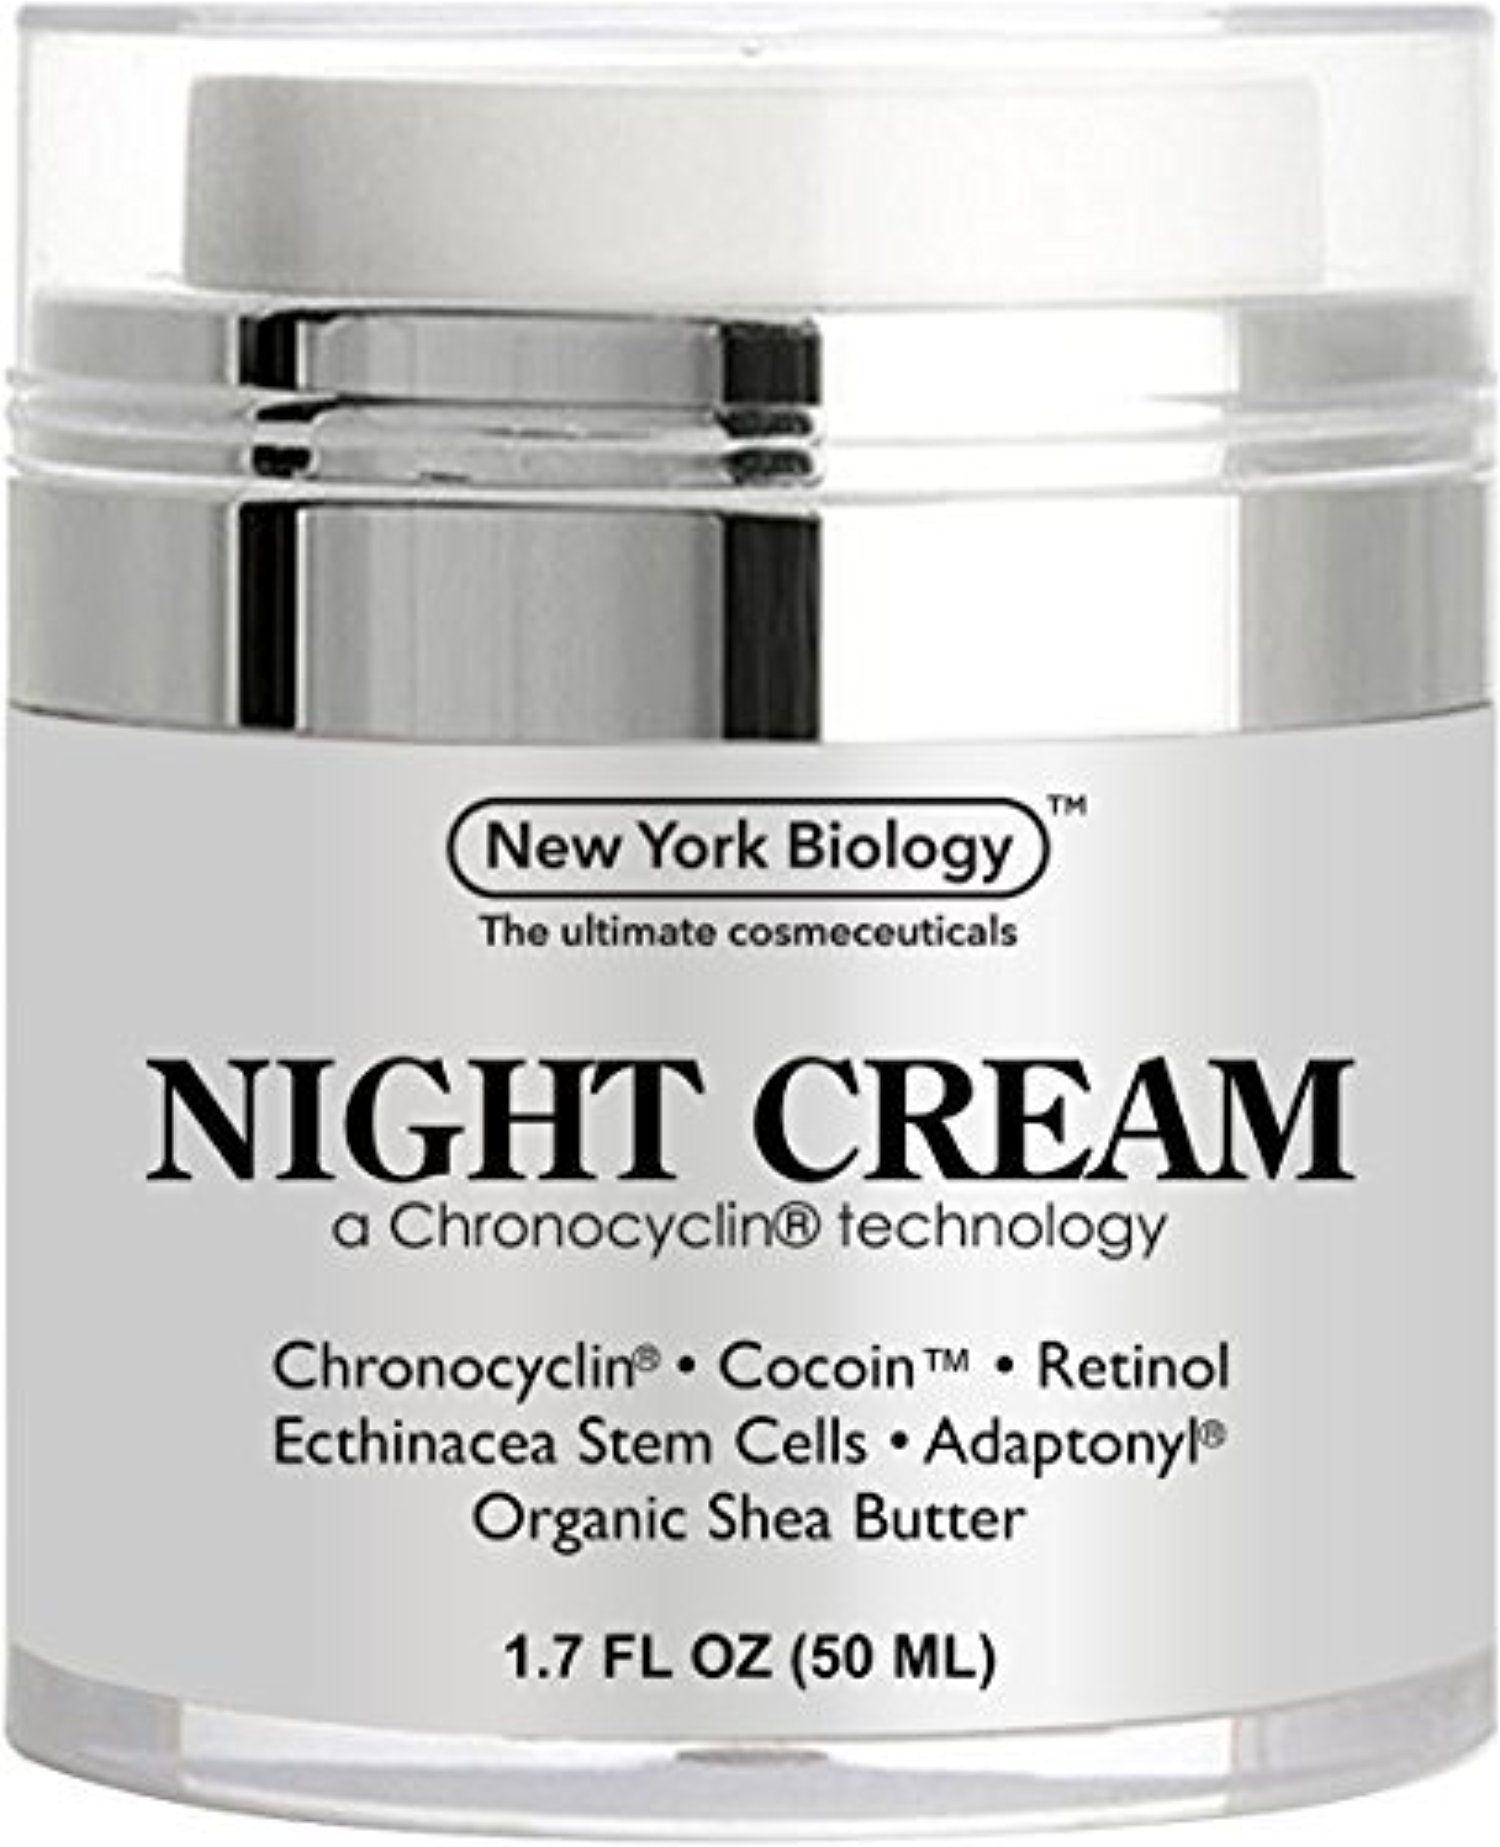 Best anti aging night cream moisturizer with retinol